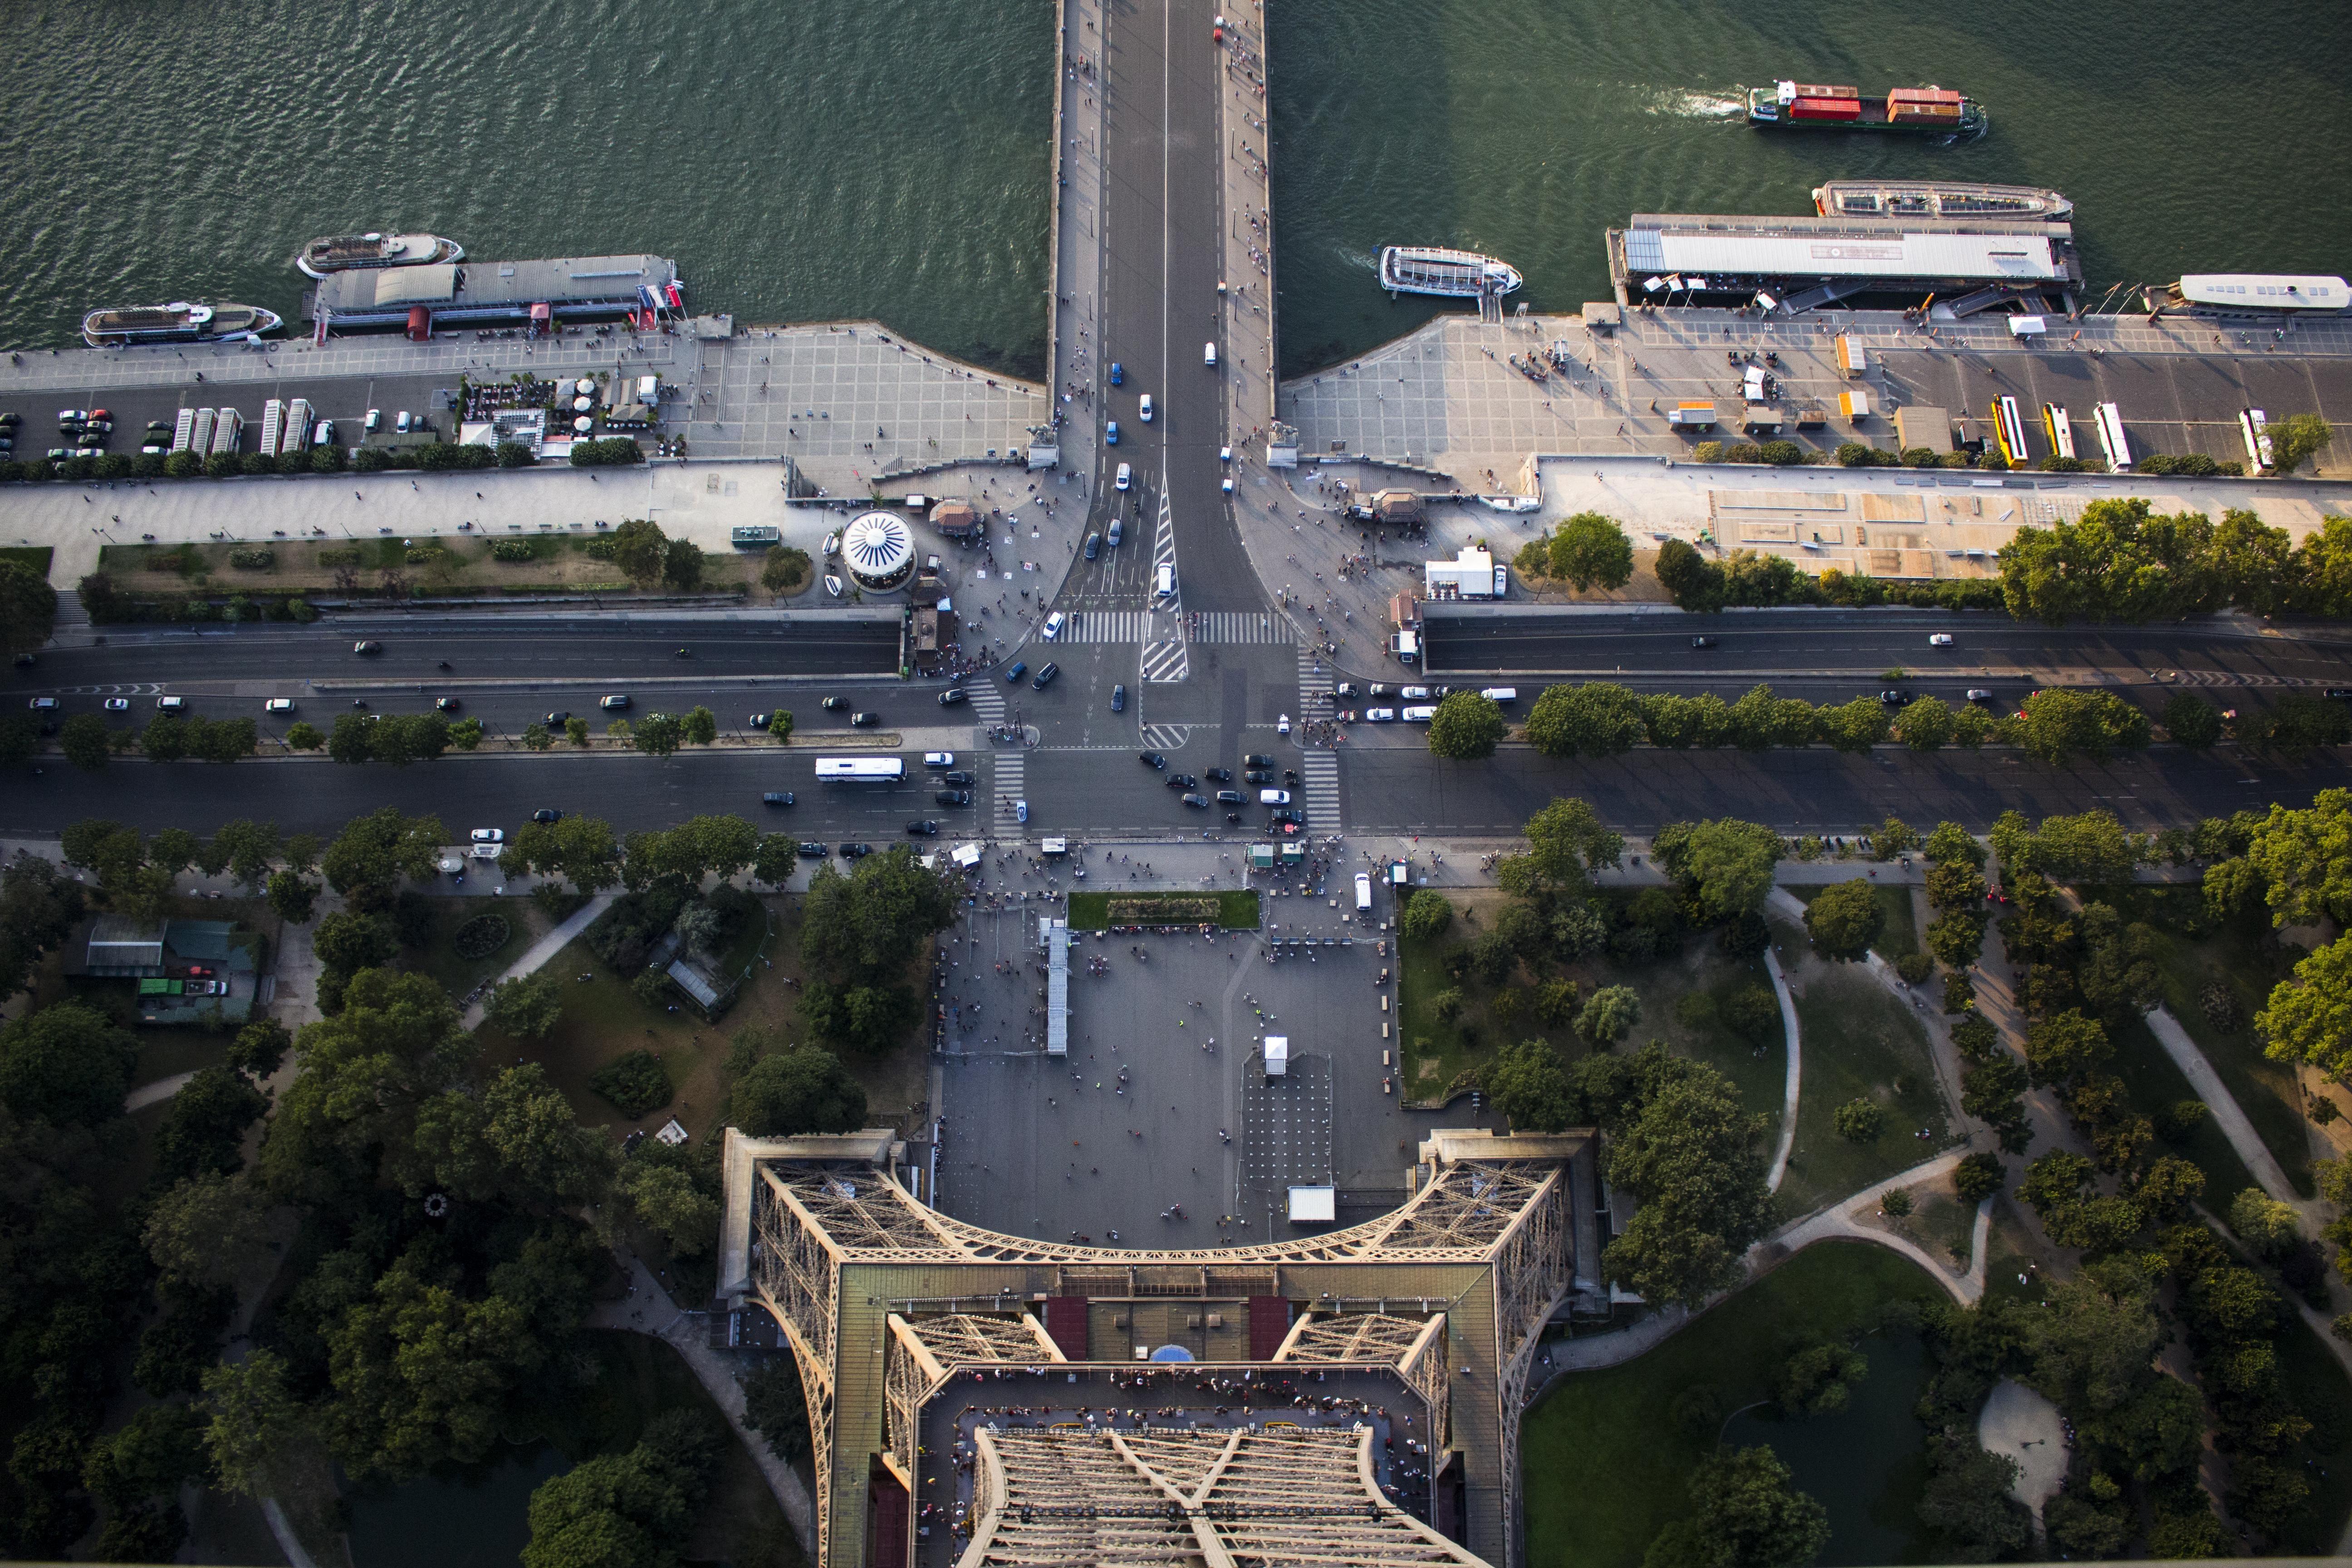 The Iron Lady - Eiffel Tower